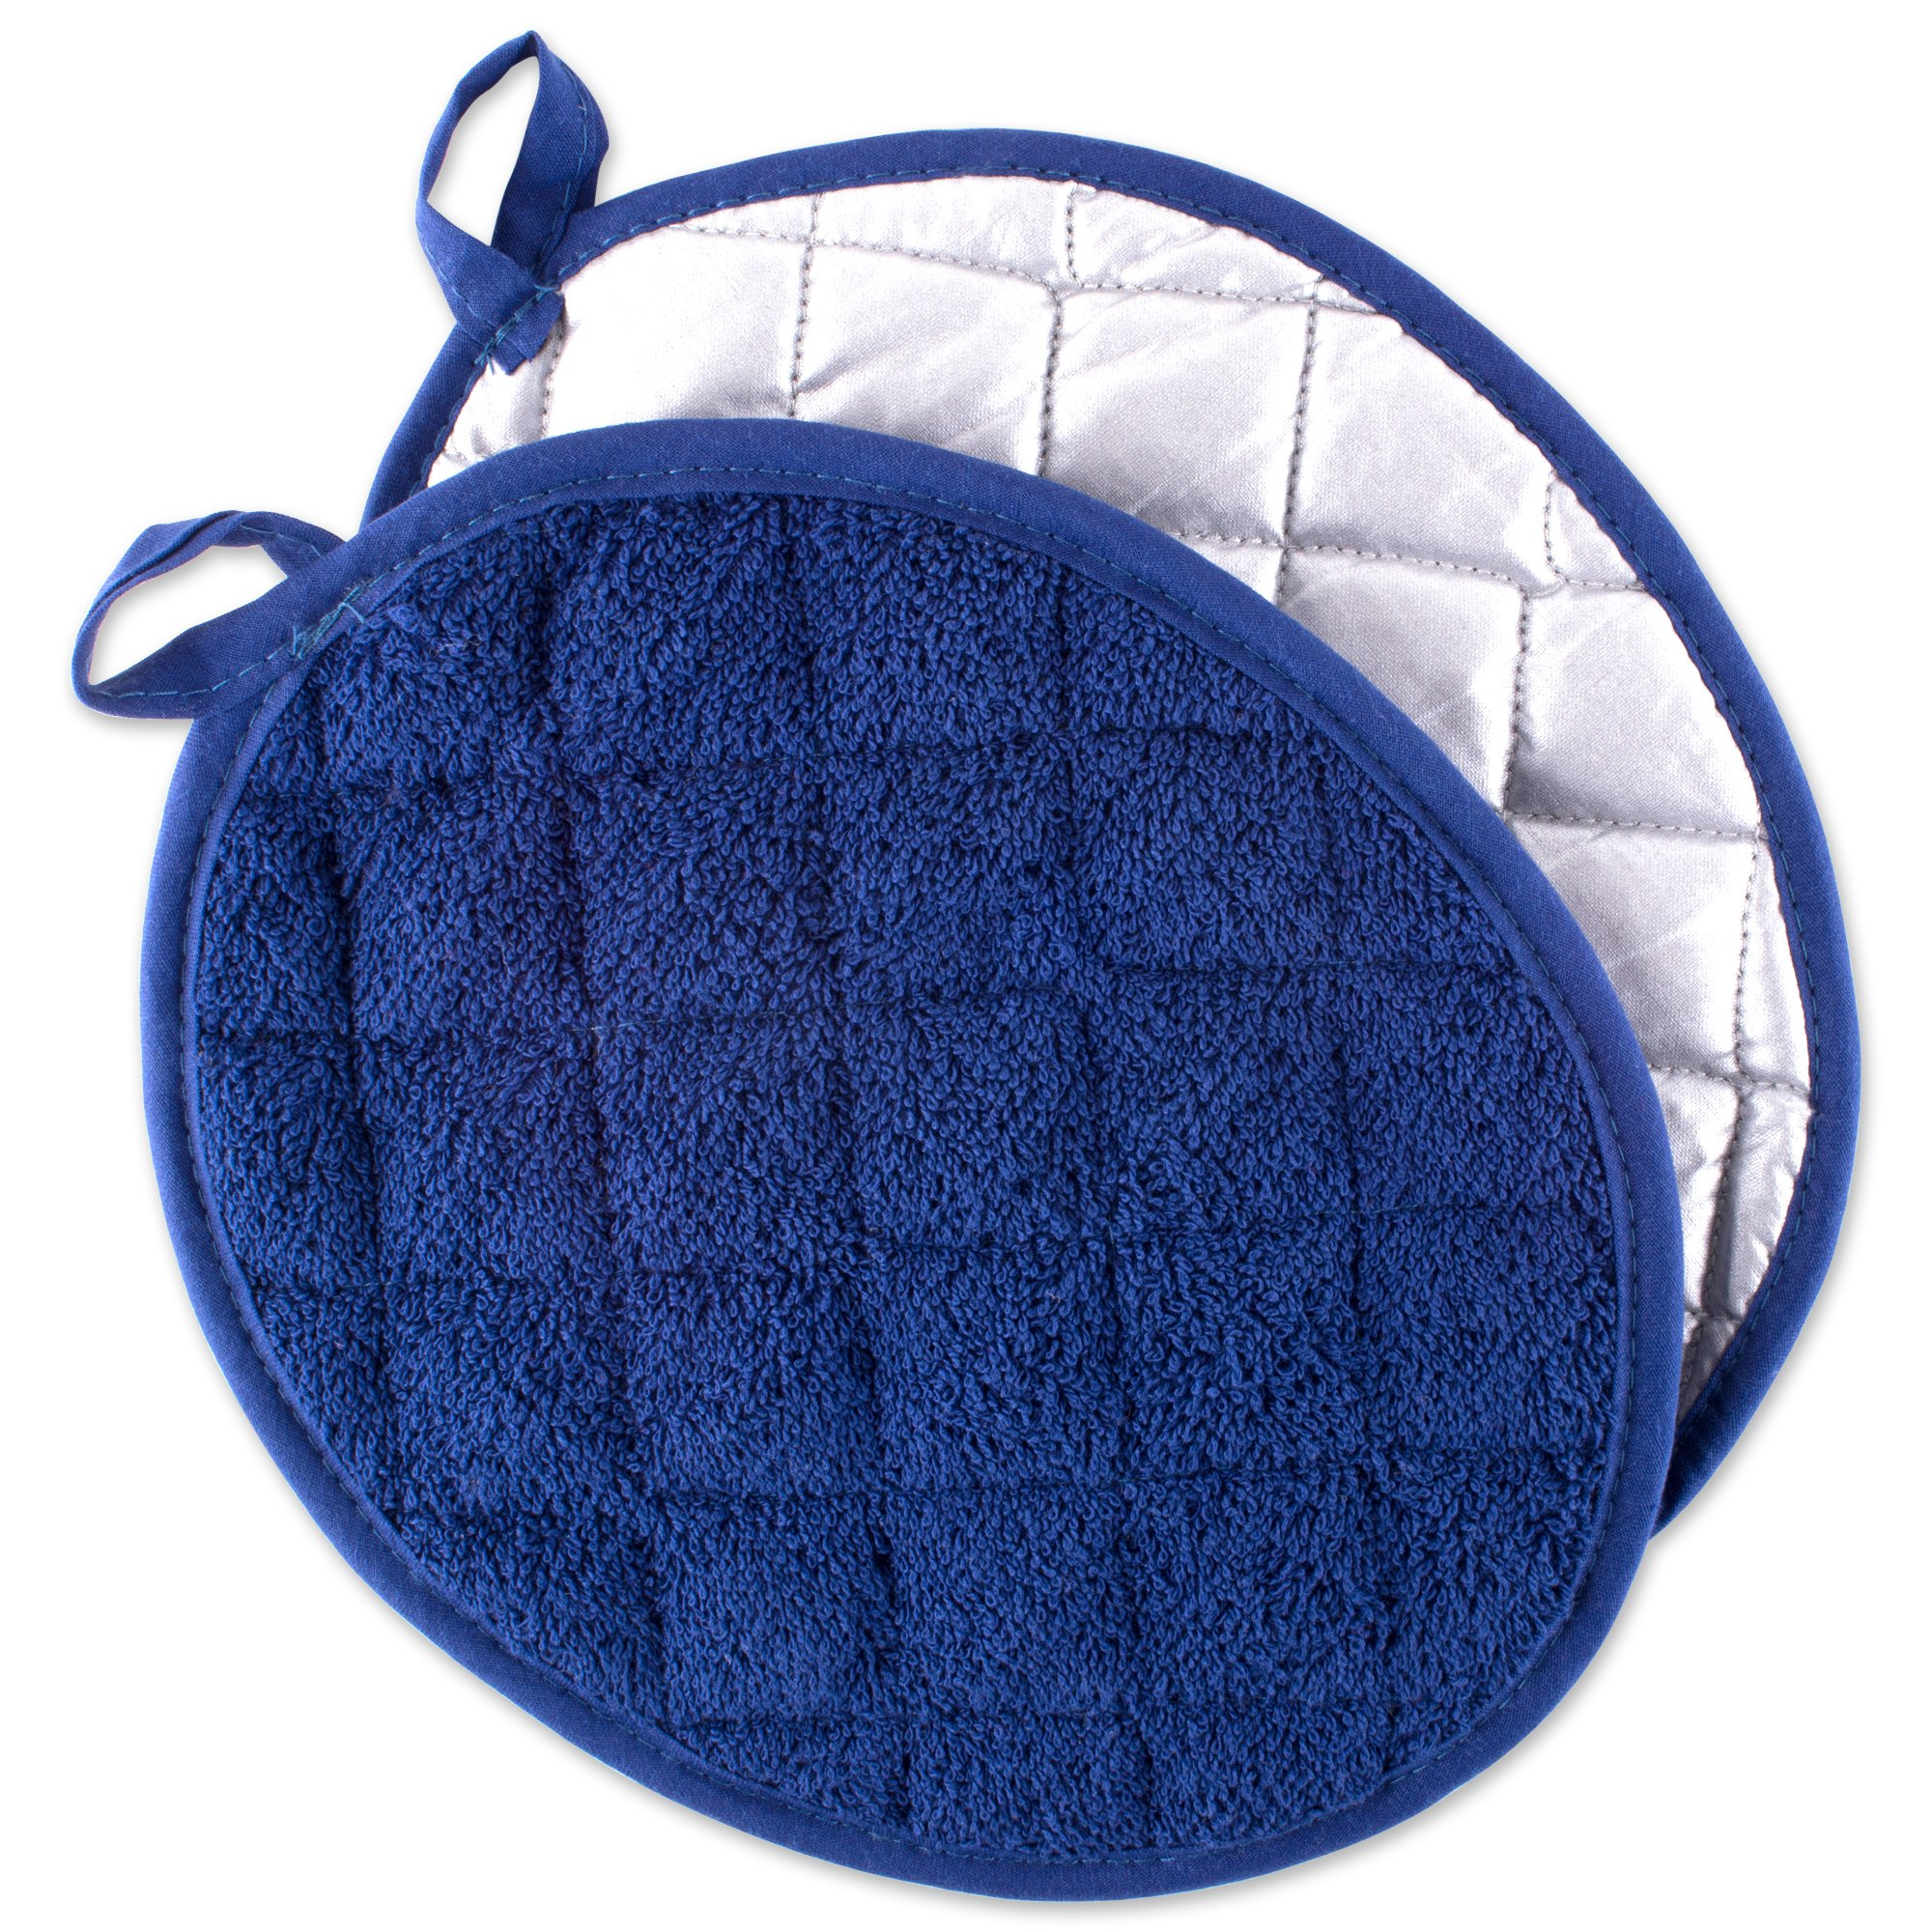 DII Everyday Kitchen Basic Oval Terry Pot Holder (Set of 2), 9.5 x 7.5, Blue